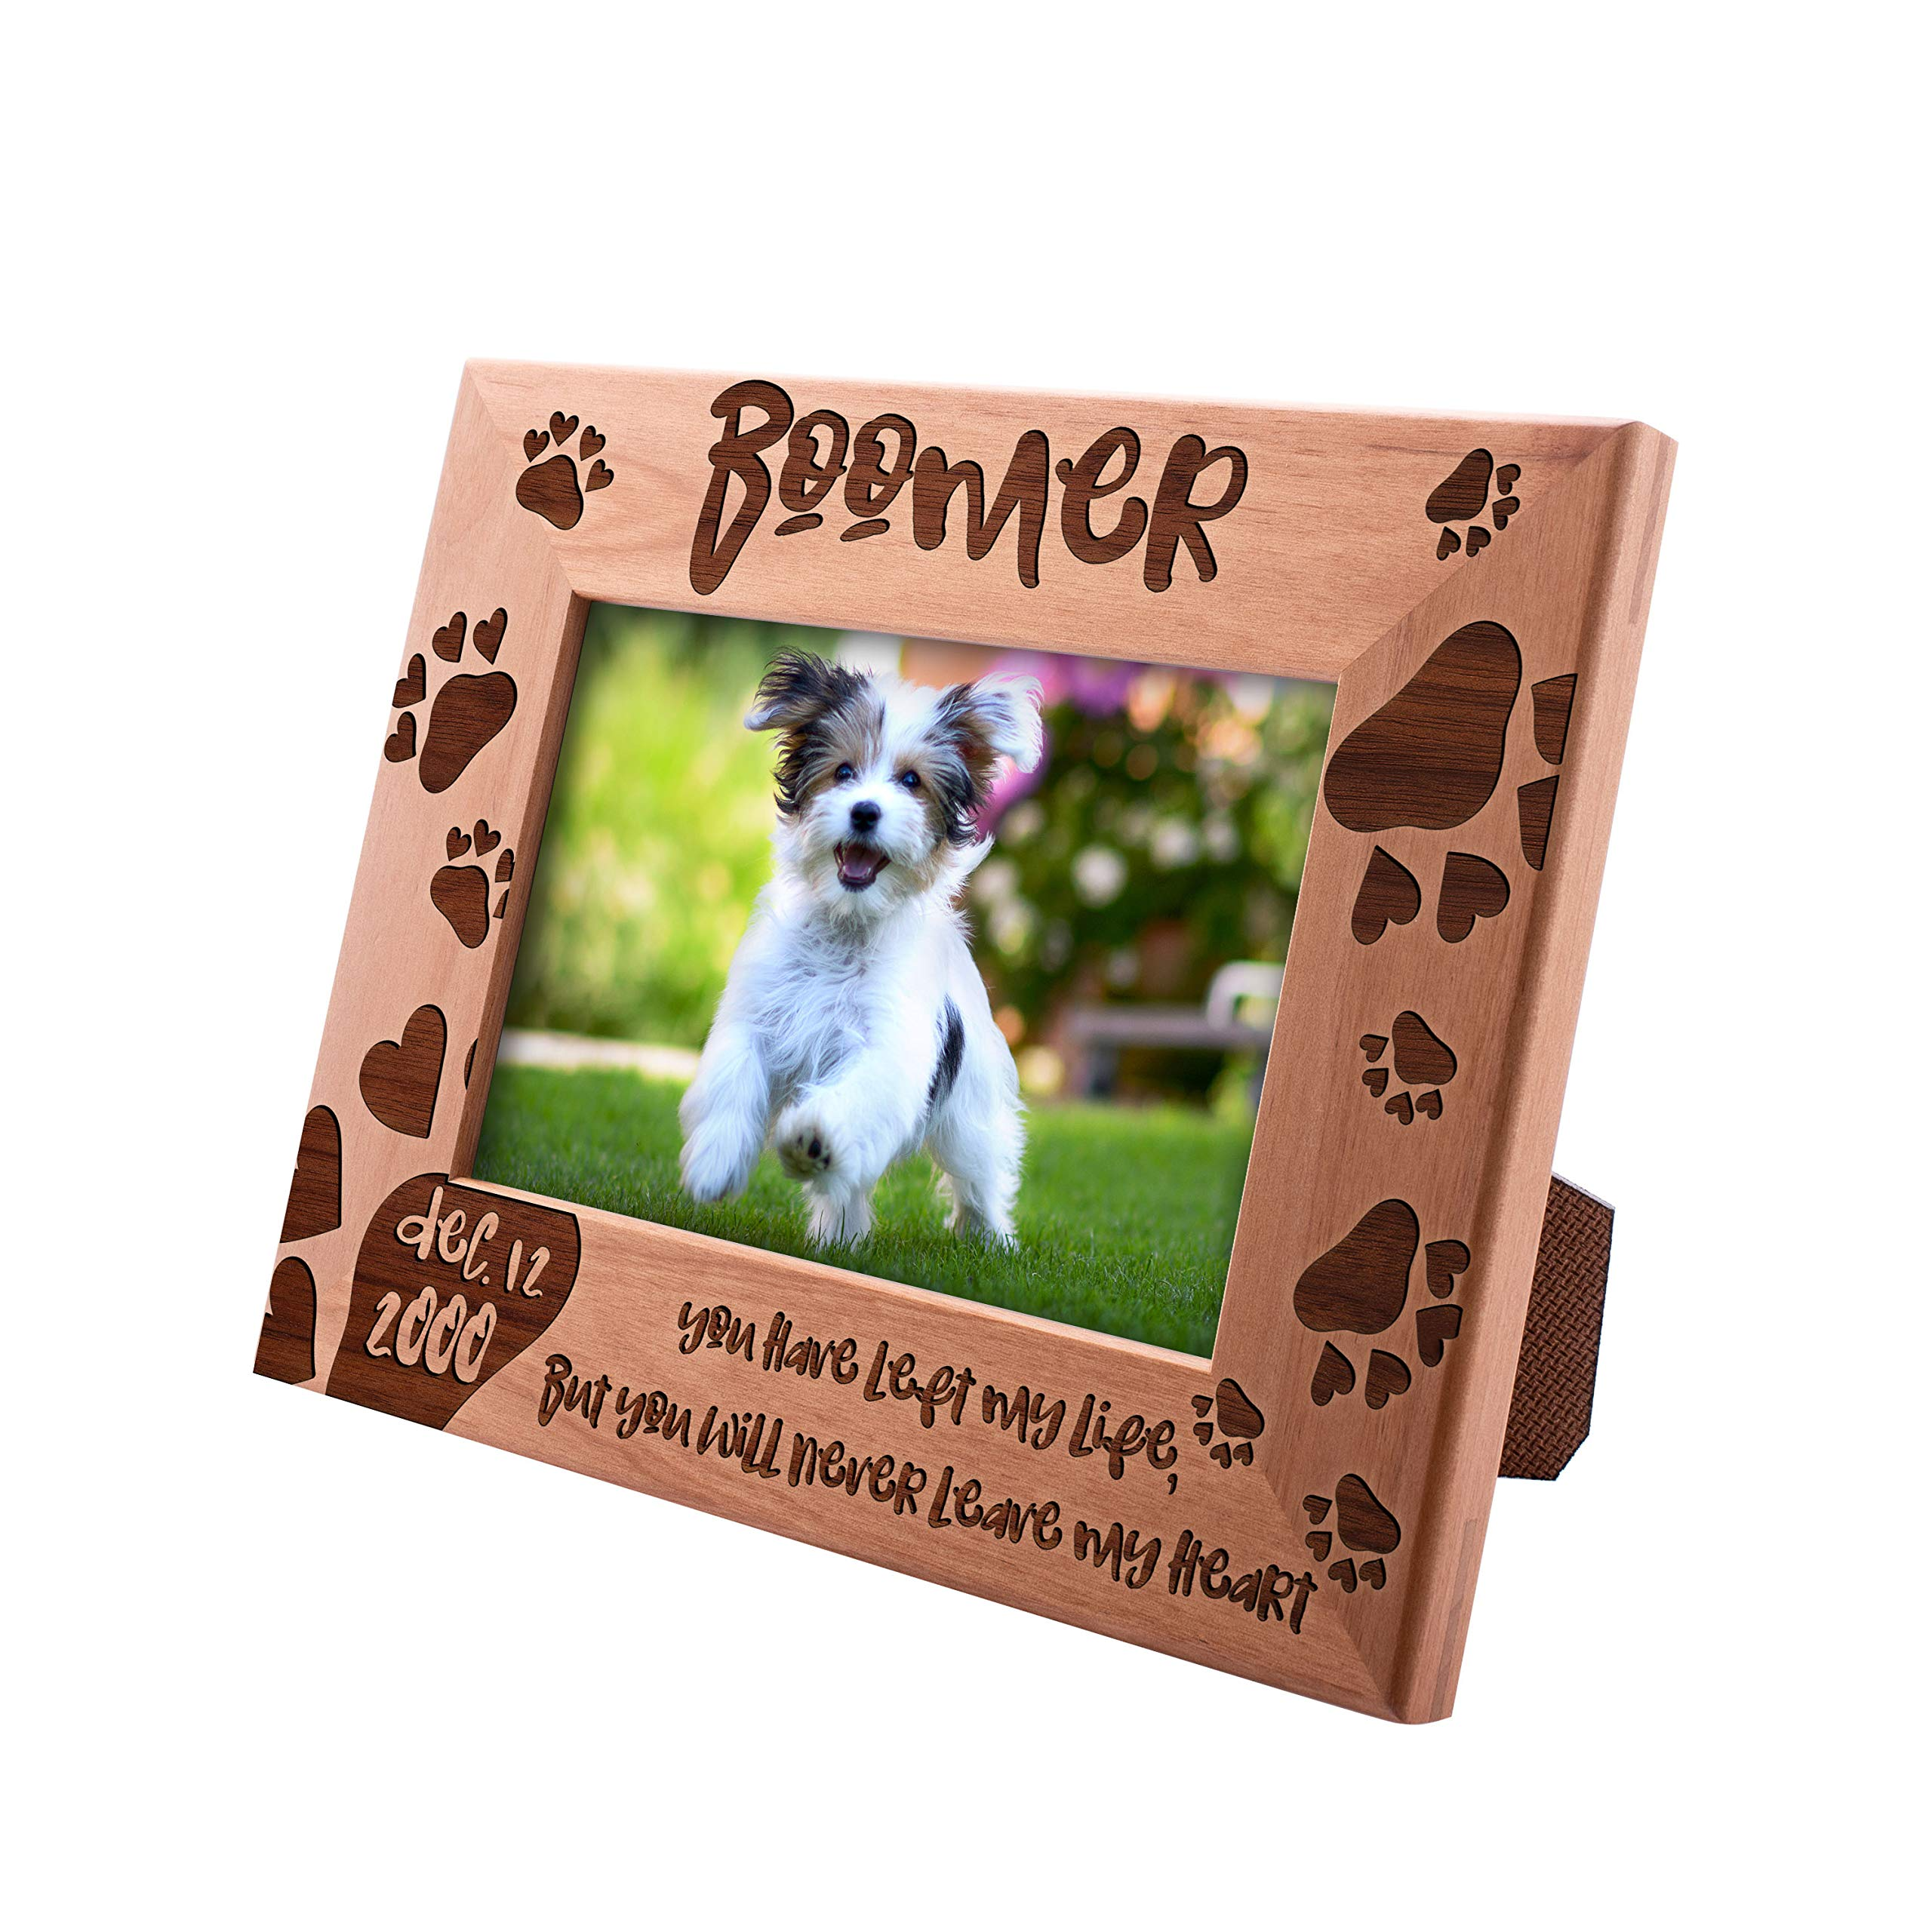 UnitedCraftSupplies Personalized Pet Picture Frames for Pet Owners 4x6, 5x7, 8x10 - Pet Memorial Picture Frame Pet Photo Frame Pet Memorial Frame #9